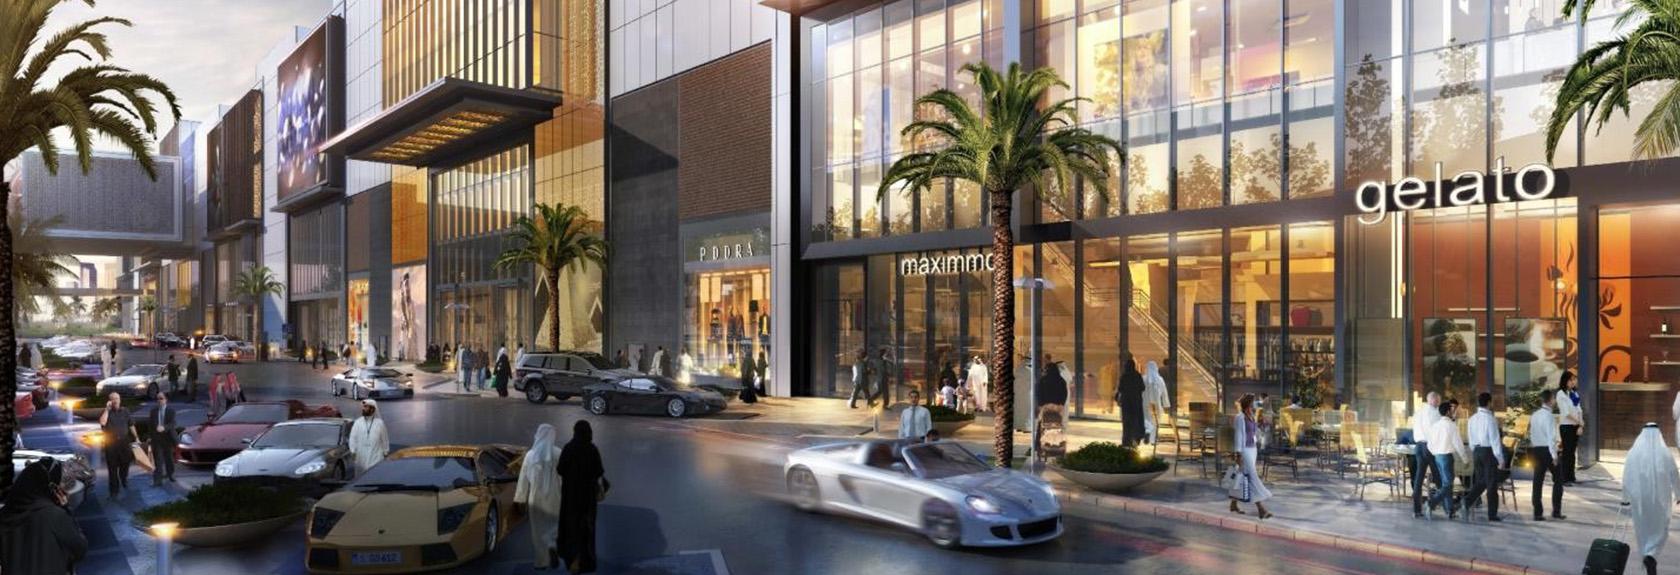 Uitbreiding Dubai Mall Zabeel in de Dubai Mall winkel geopend